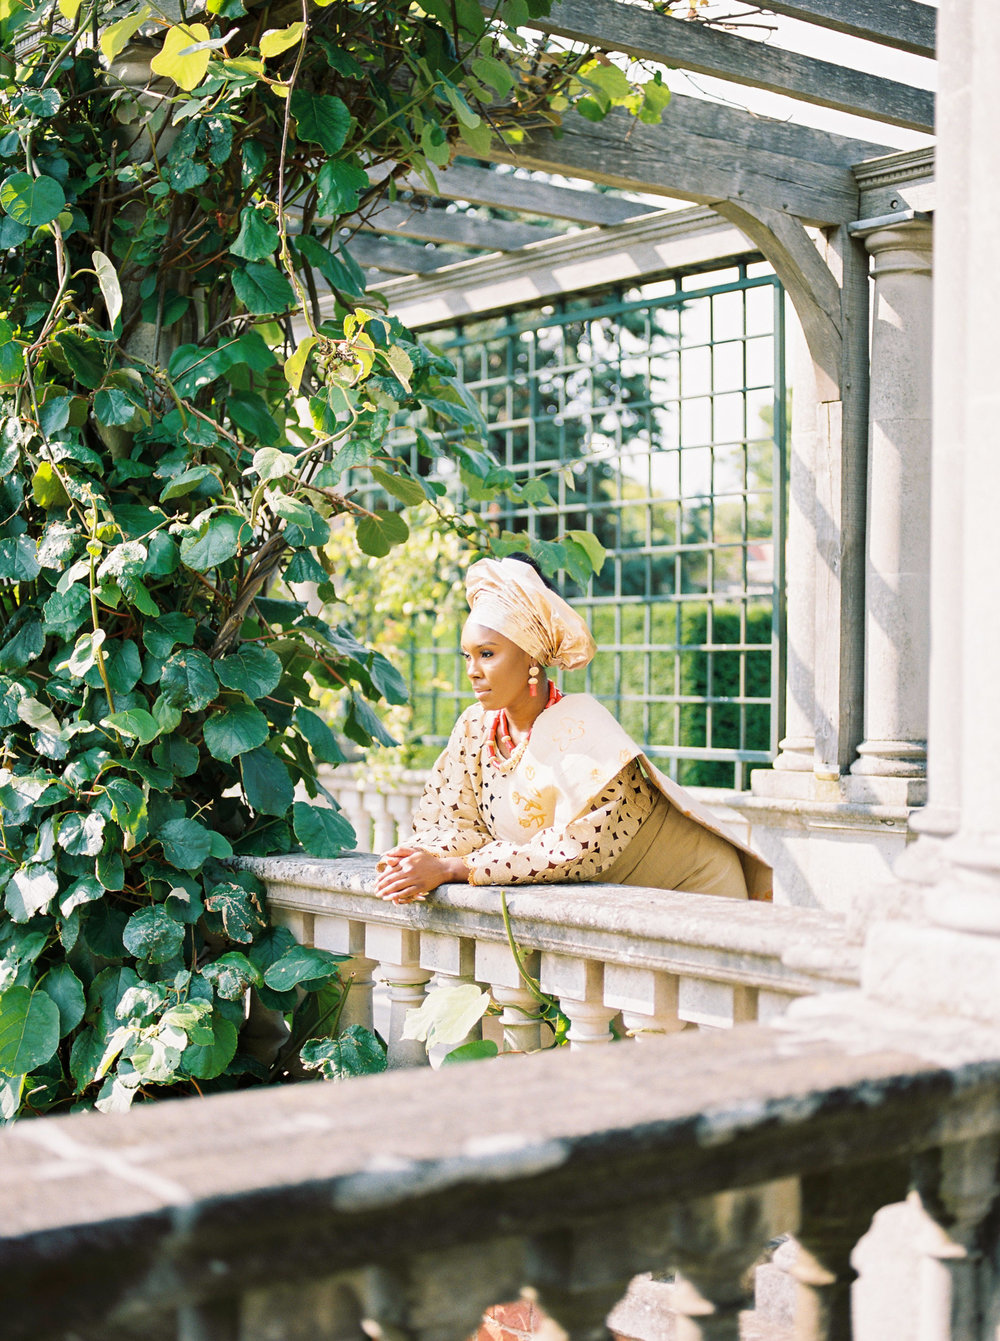 Amy O'Boyle Photography- Destination & UK Fine Art Film Wedding Photographer- The Pergola and Hill Garden Wedding-25.jpg